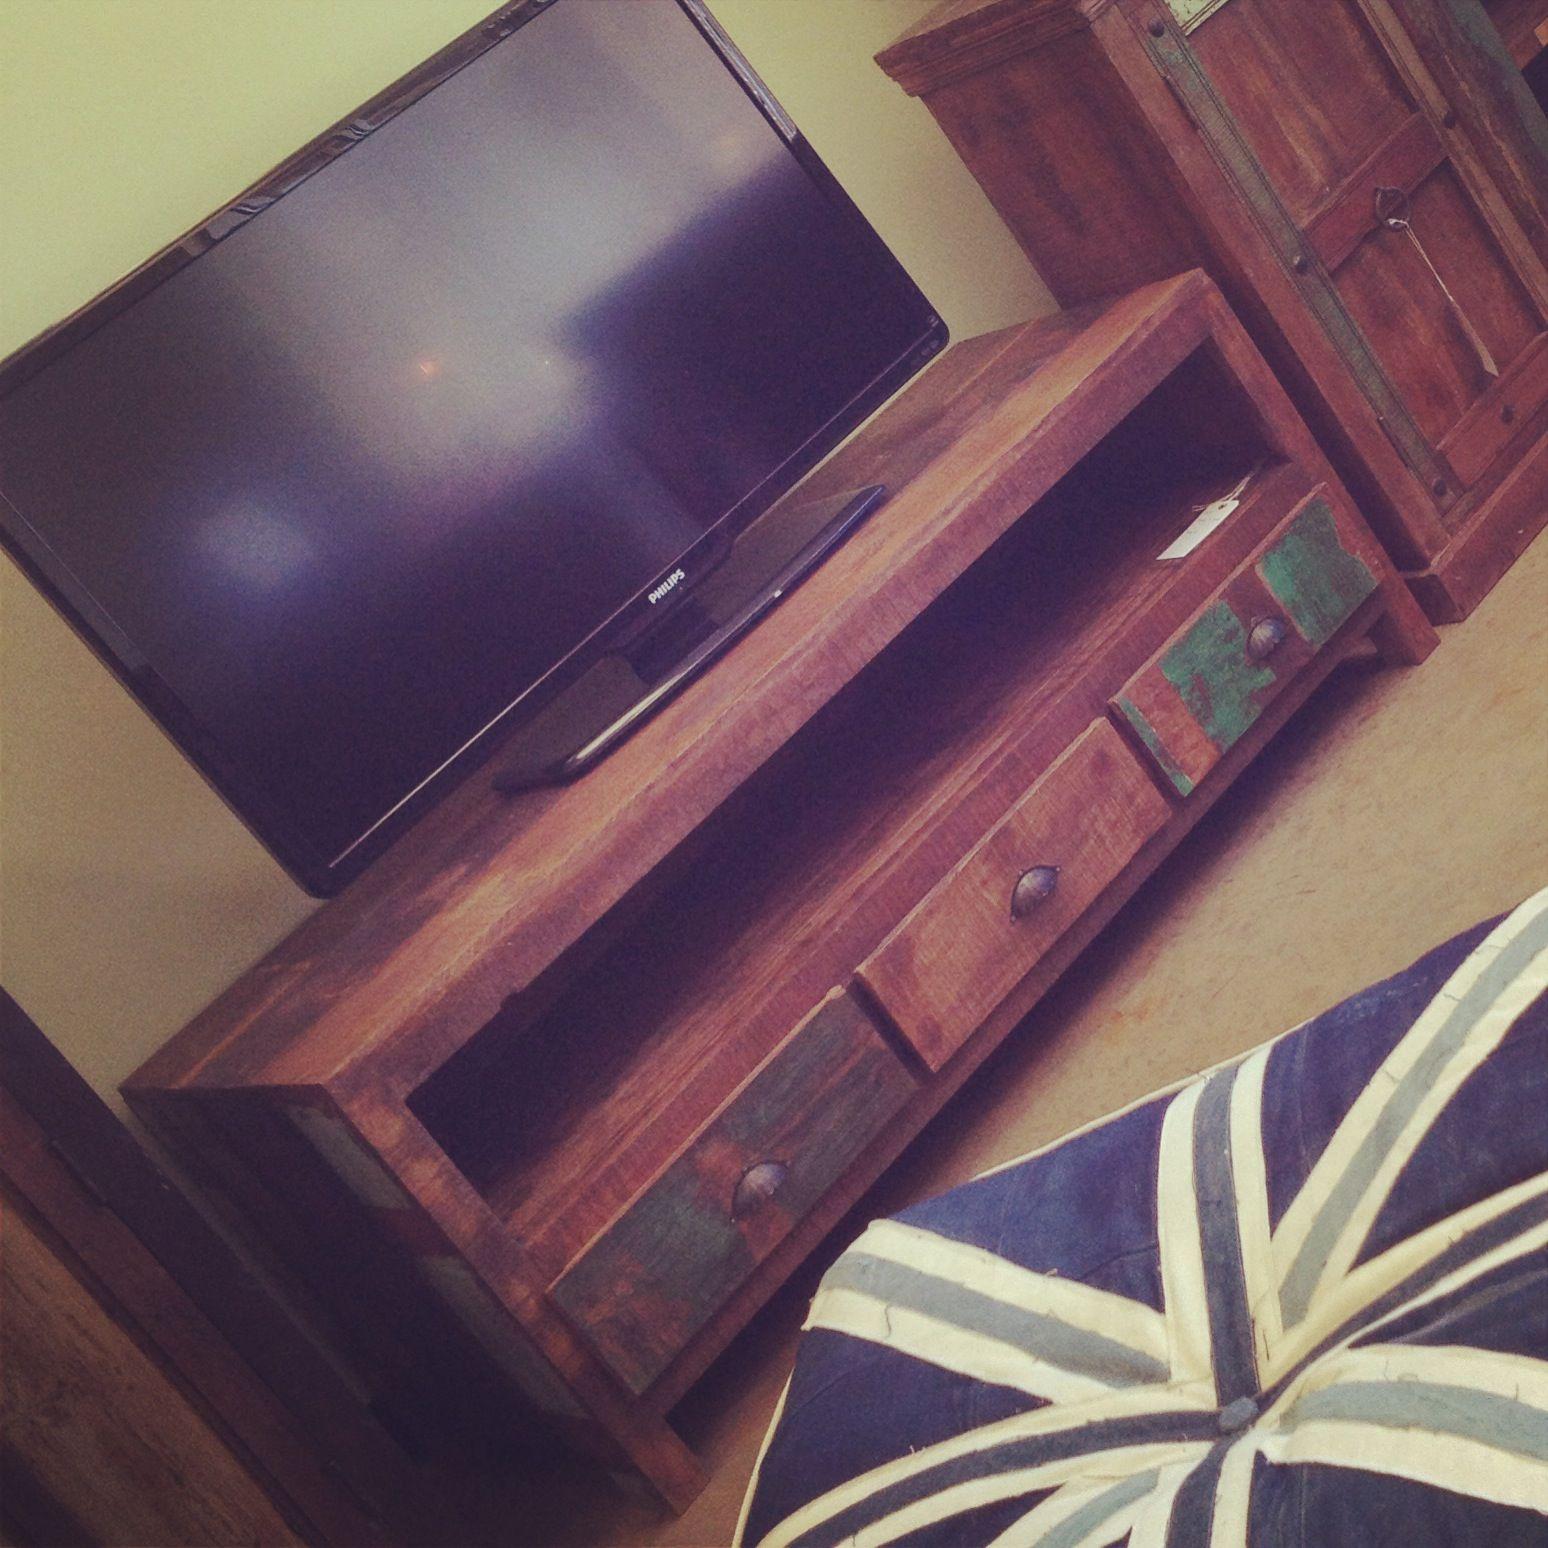 Low Media Console Import, Distressed, Rustic, Unique, Vintage Furniture  Fayetteville, AR